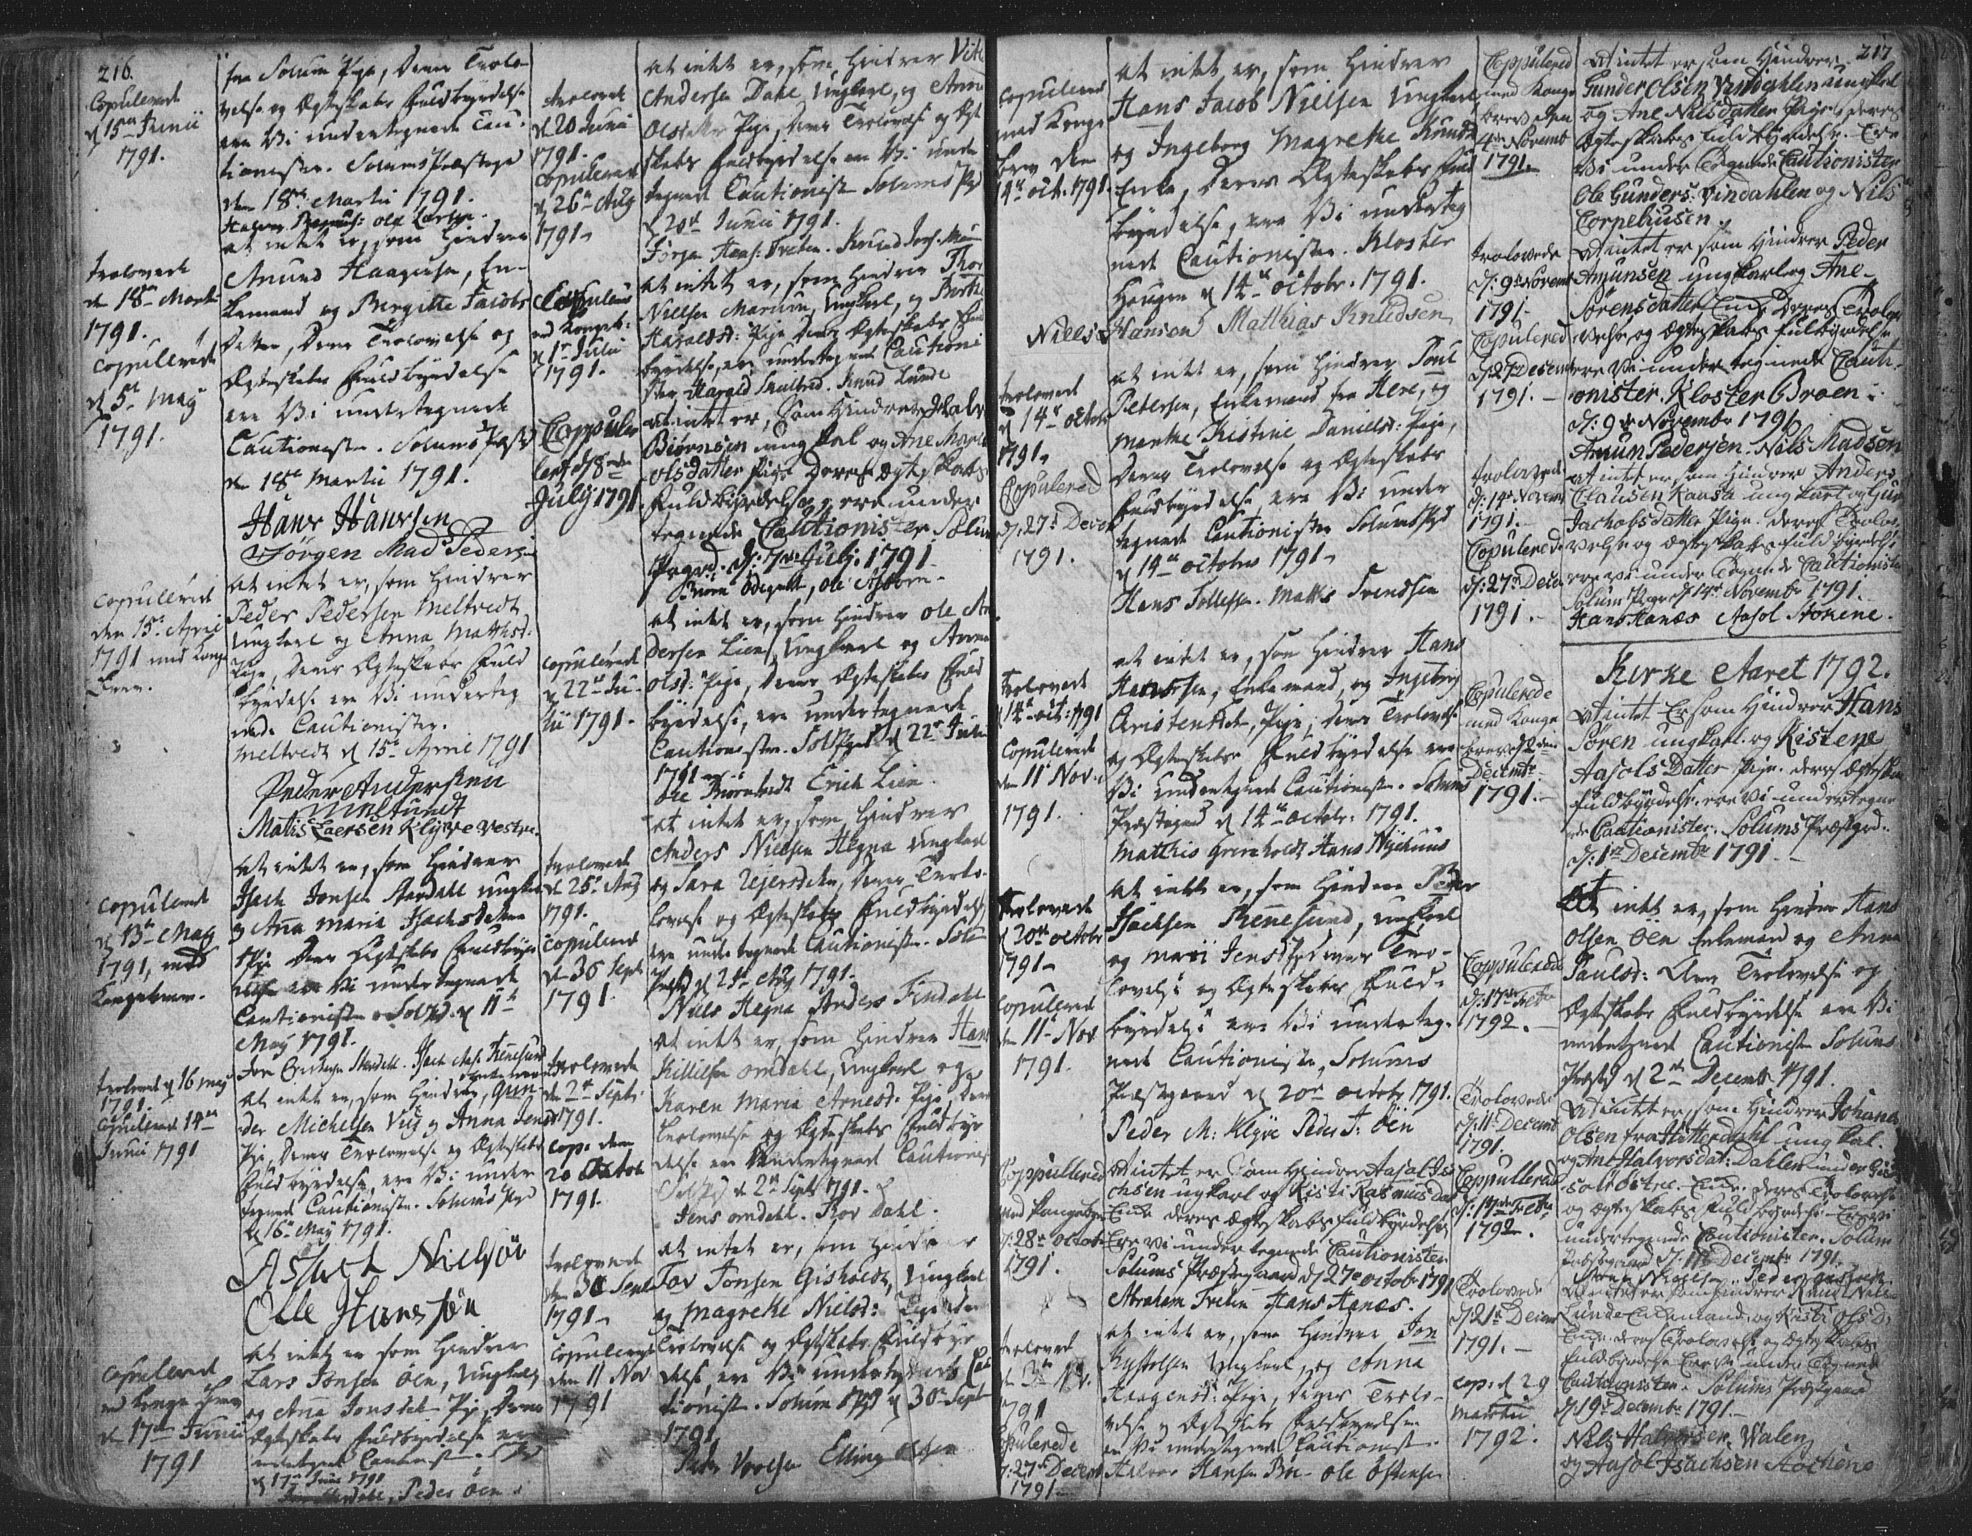 SAKO, Solum kirkebøker, F/Fa/L0003: Ministerialbok nr. I 3, 1761-1814, s. 216-217